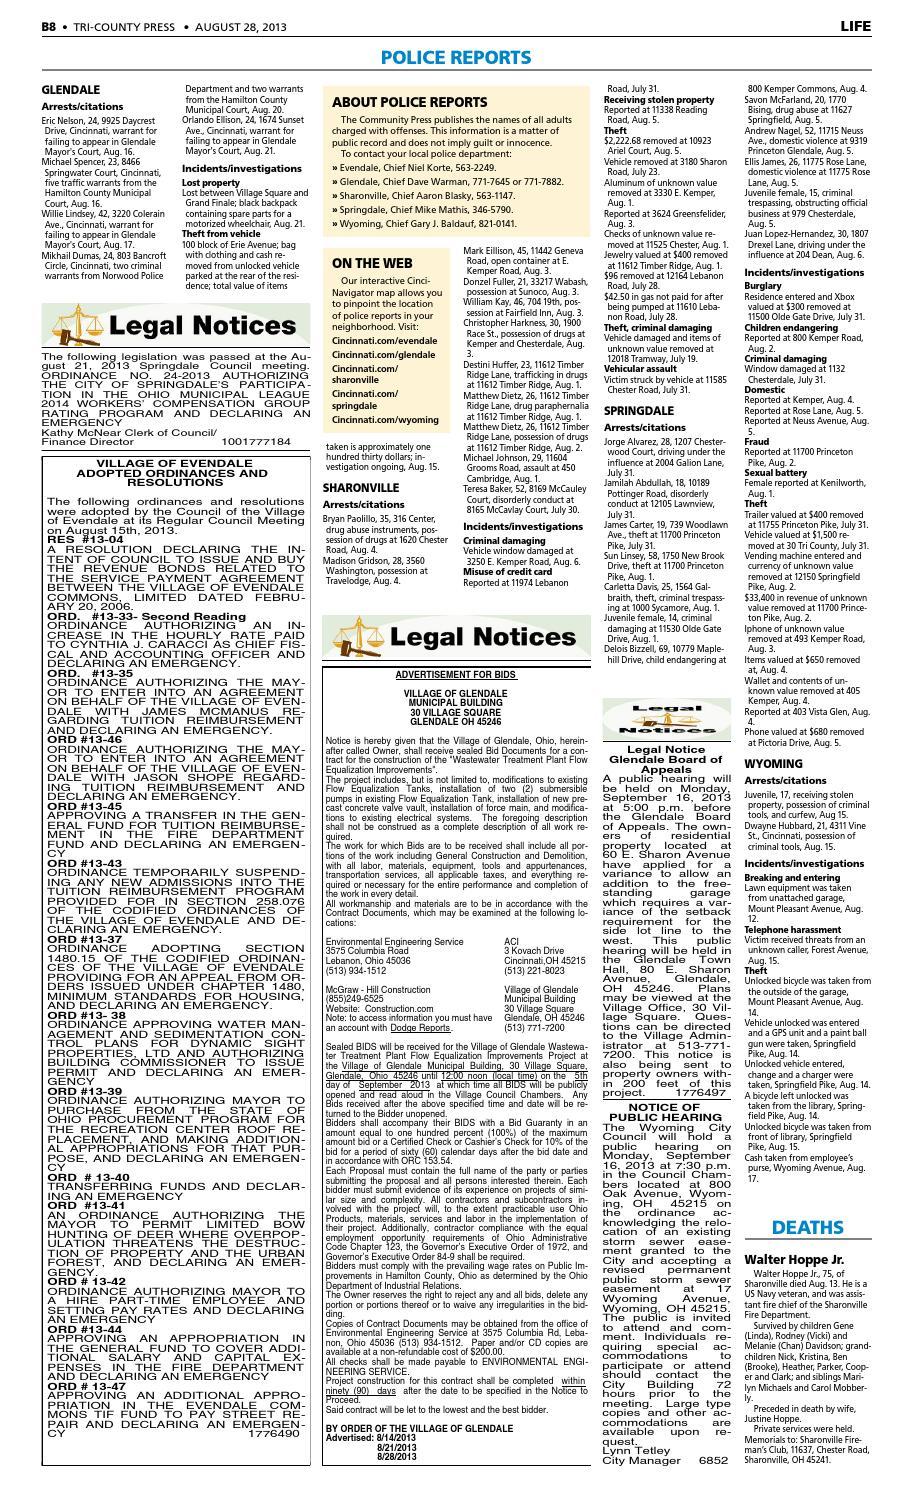 Tri county press 082813 by Enquirer Media - issuu